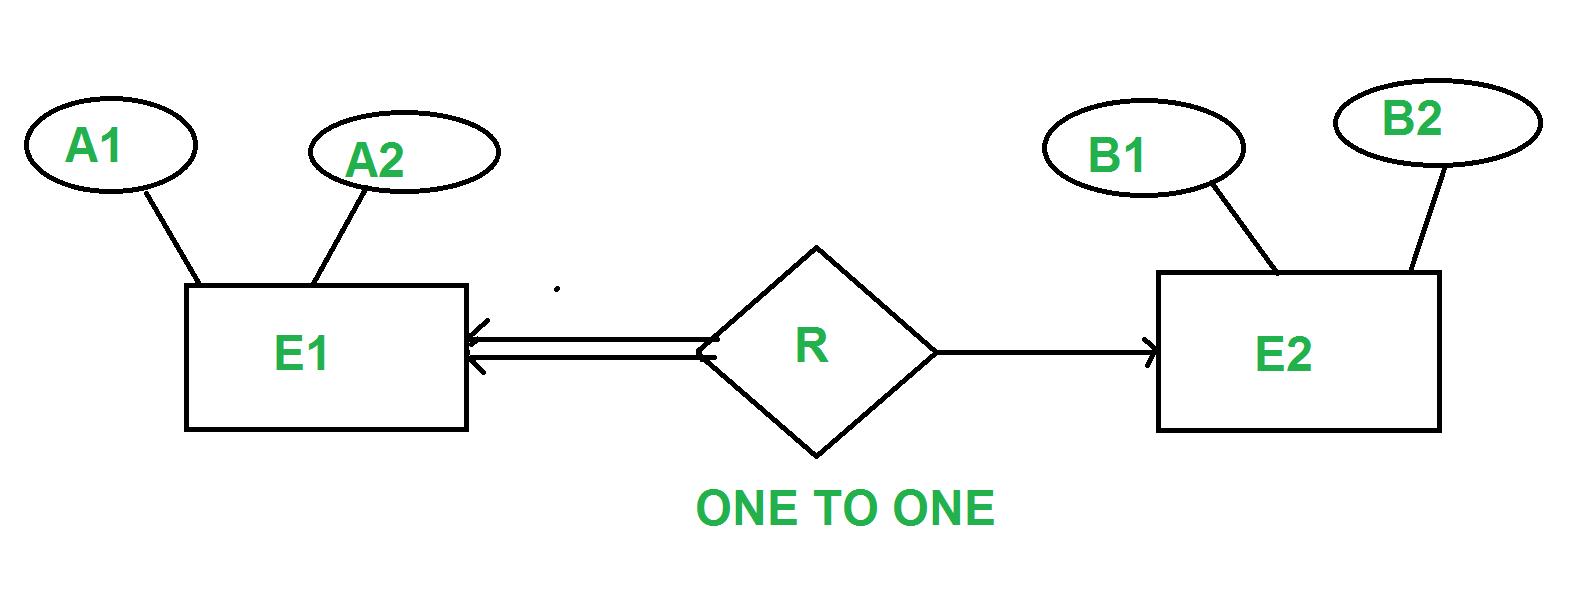 Minimization Of Er Diagrams - Geeksforgeeks inside Primary Key In Er Diagram